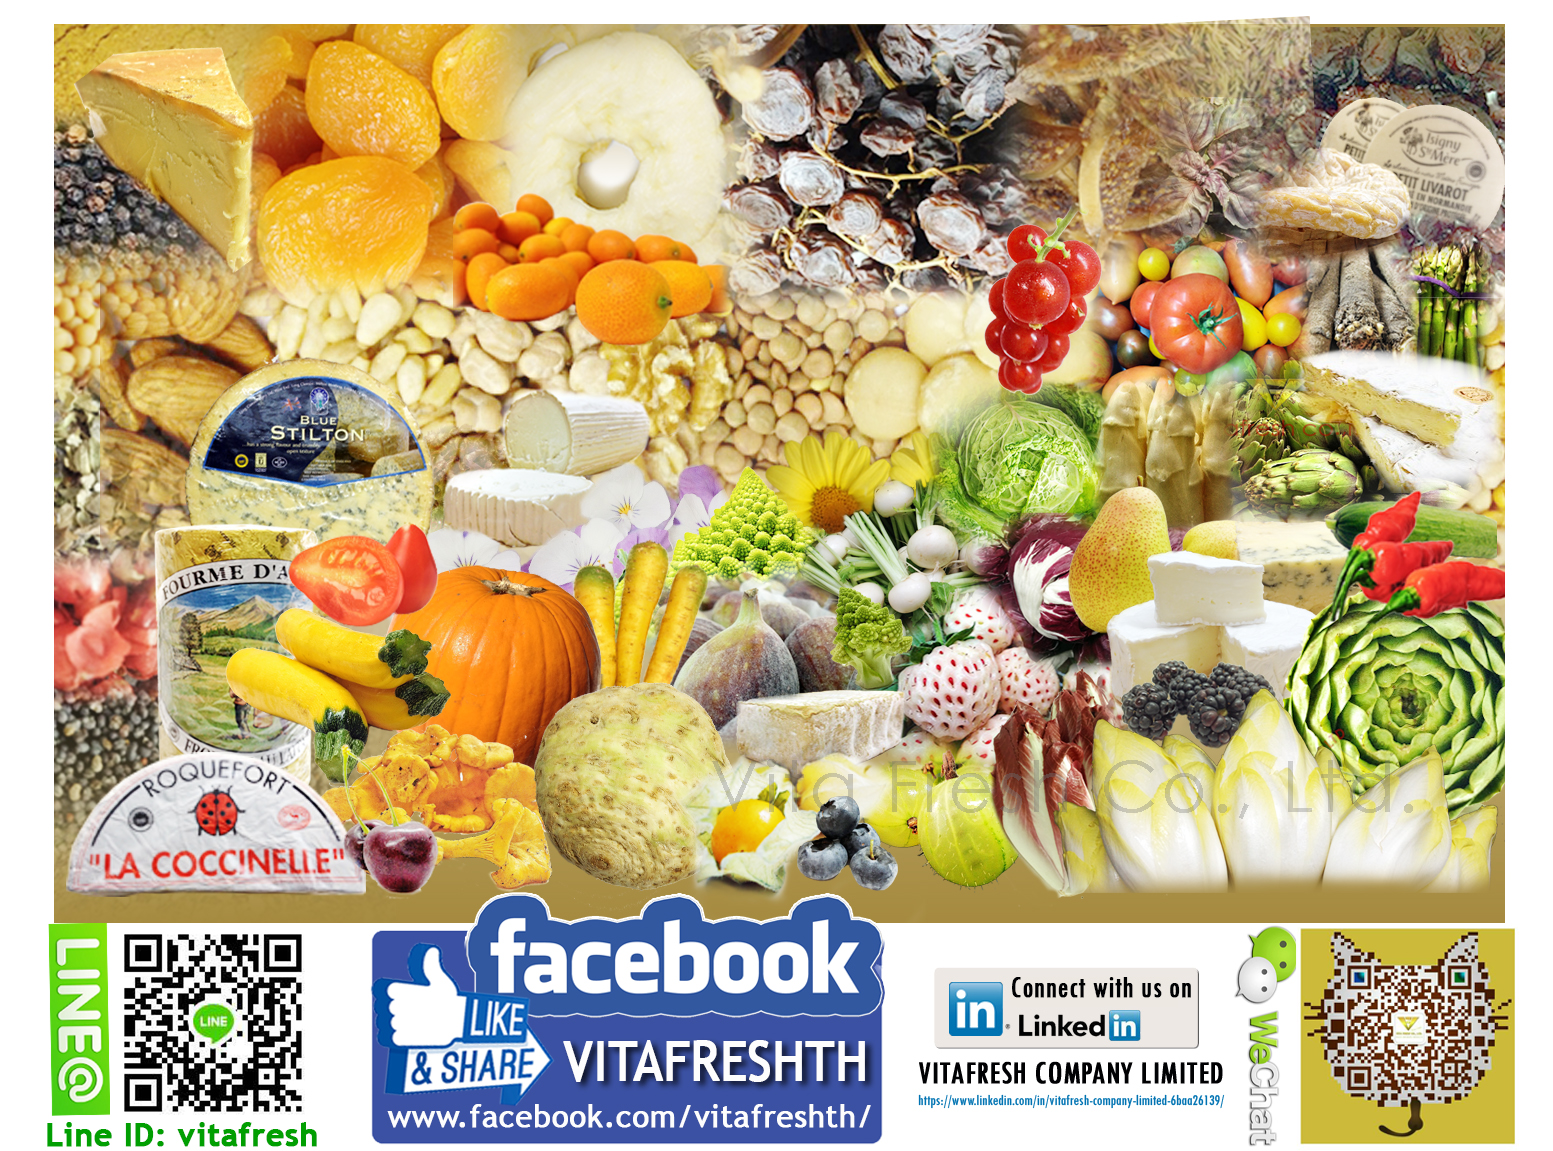 Vitafresh Finest imported food Thailand